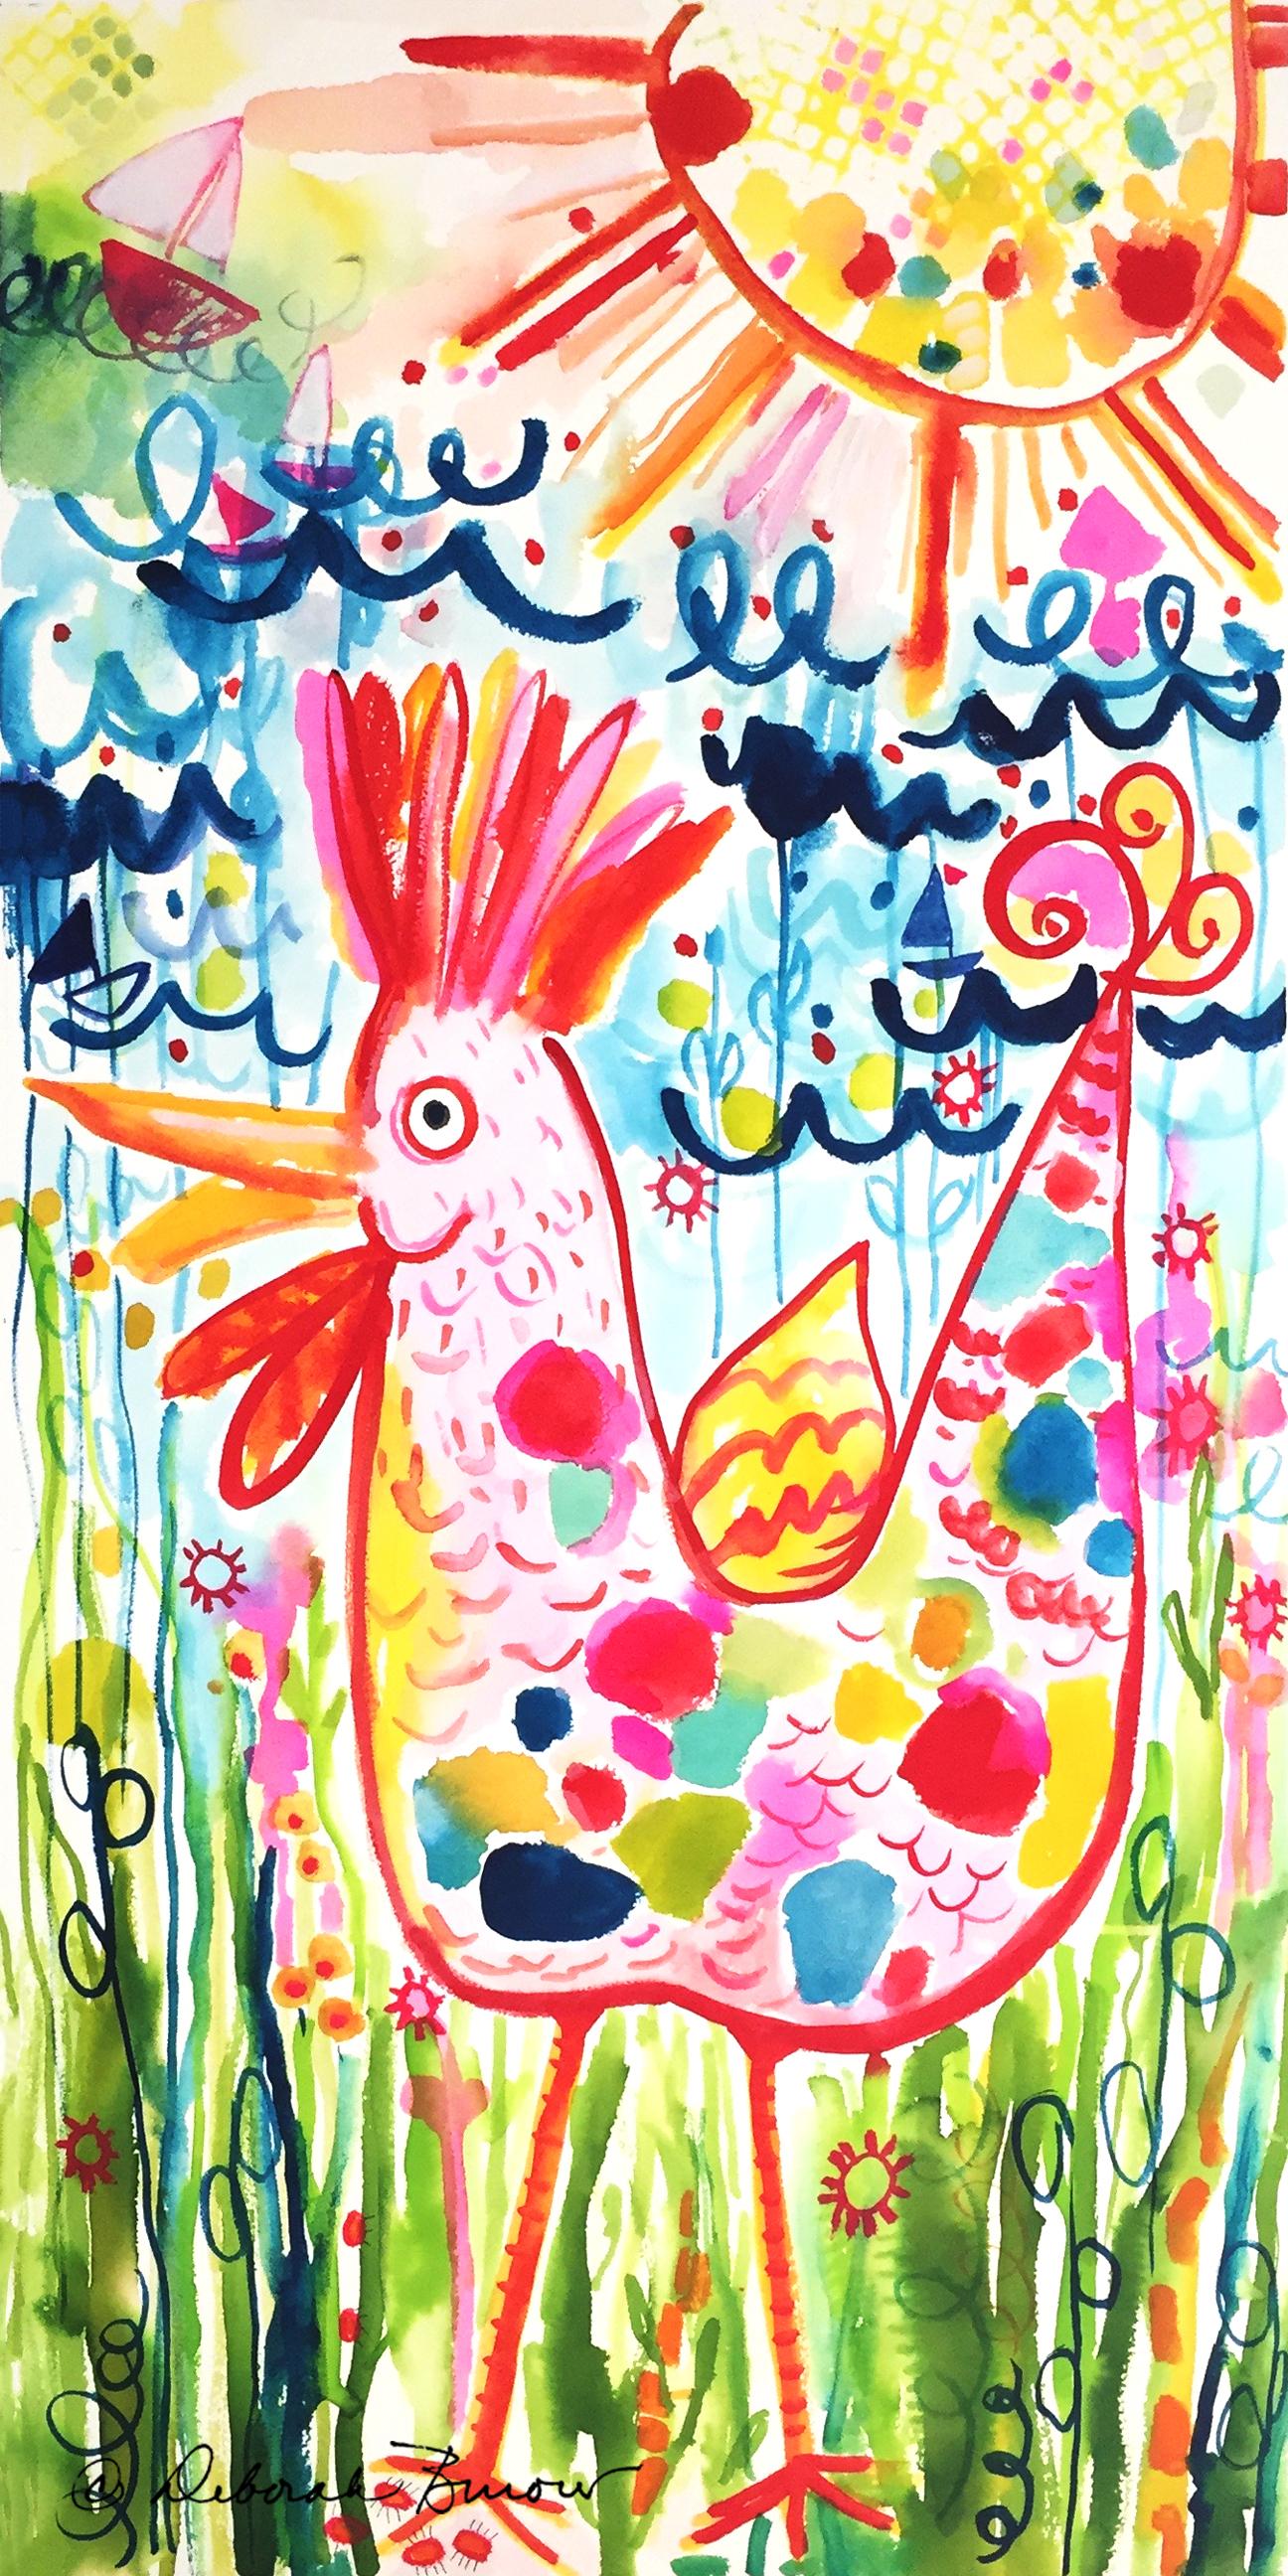 FUN & WHIMSICAL — Deborah Burow Art